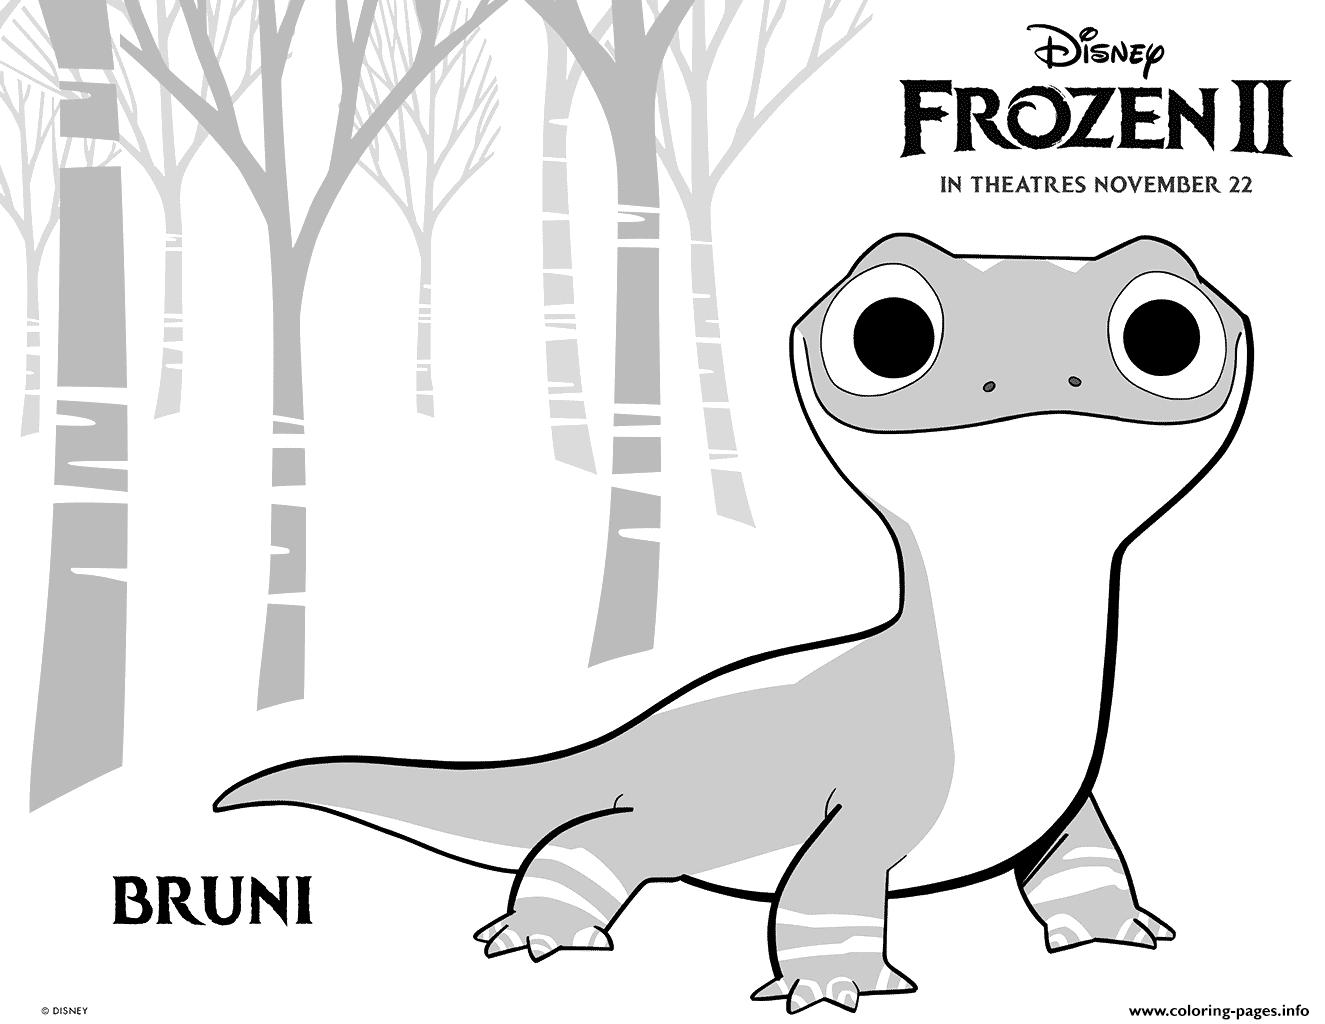 Print Disney Frozen 2 Bruni Salamander Coloring Pages Frozen Coloring Frozen Coloring Pages Disney Coloring Pages